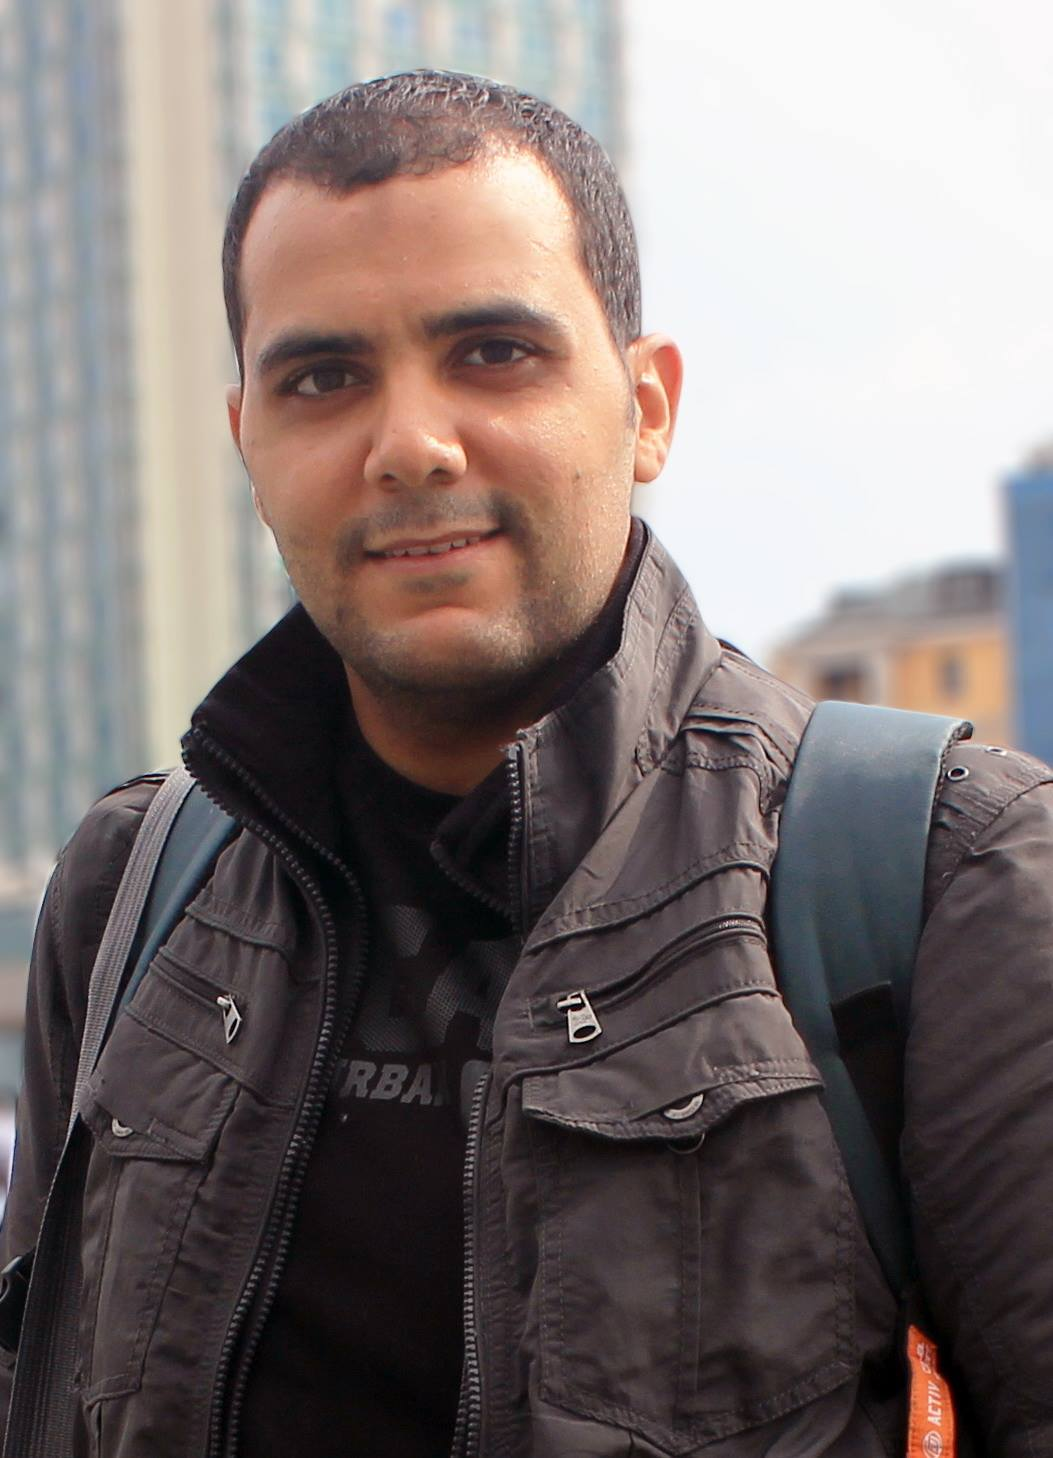 Hashem Halaby